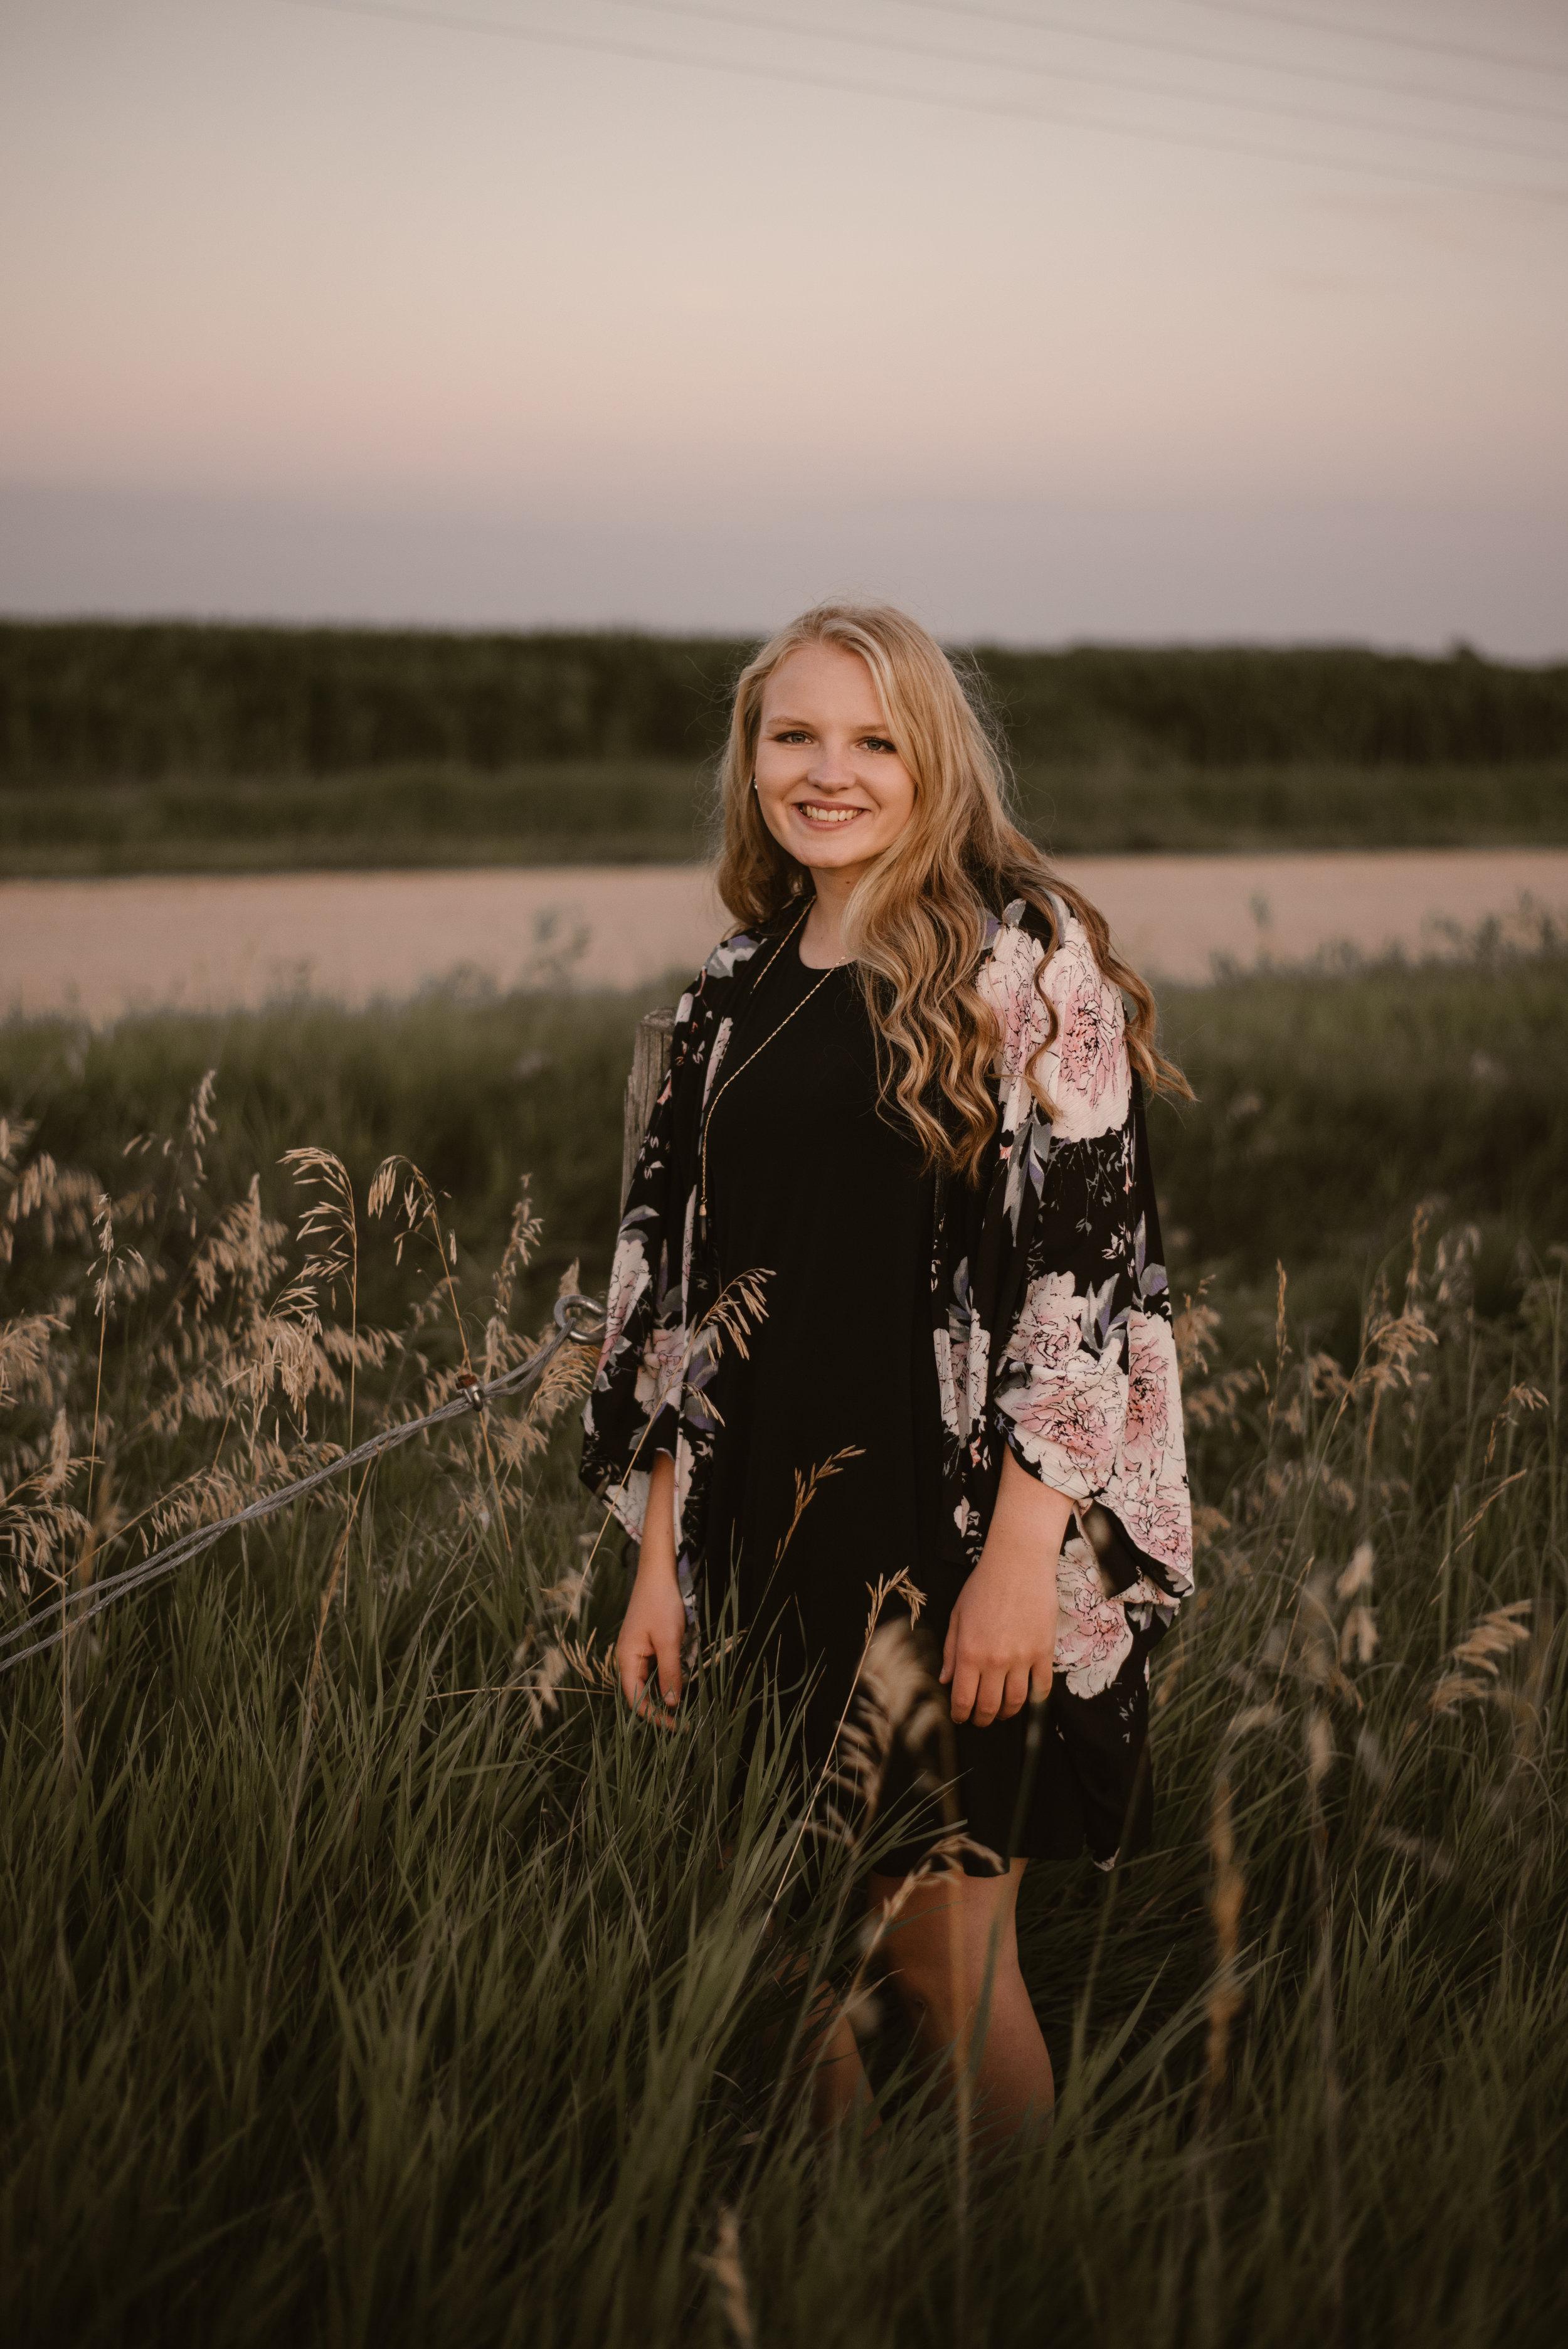 Kaylie-Sirek-Photography-Grand-Island-Nebraska-Senior-022.jpg